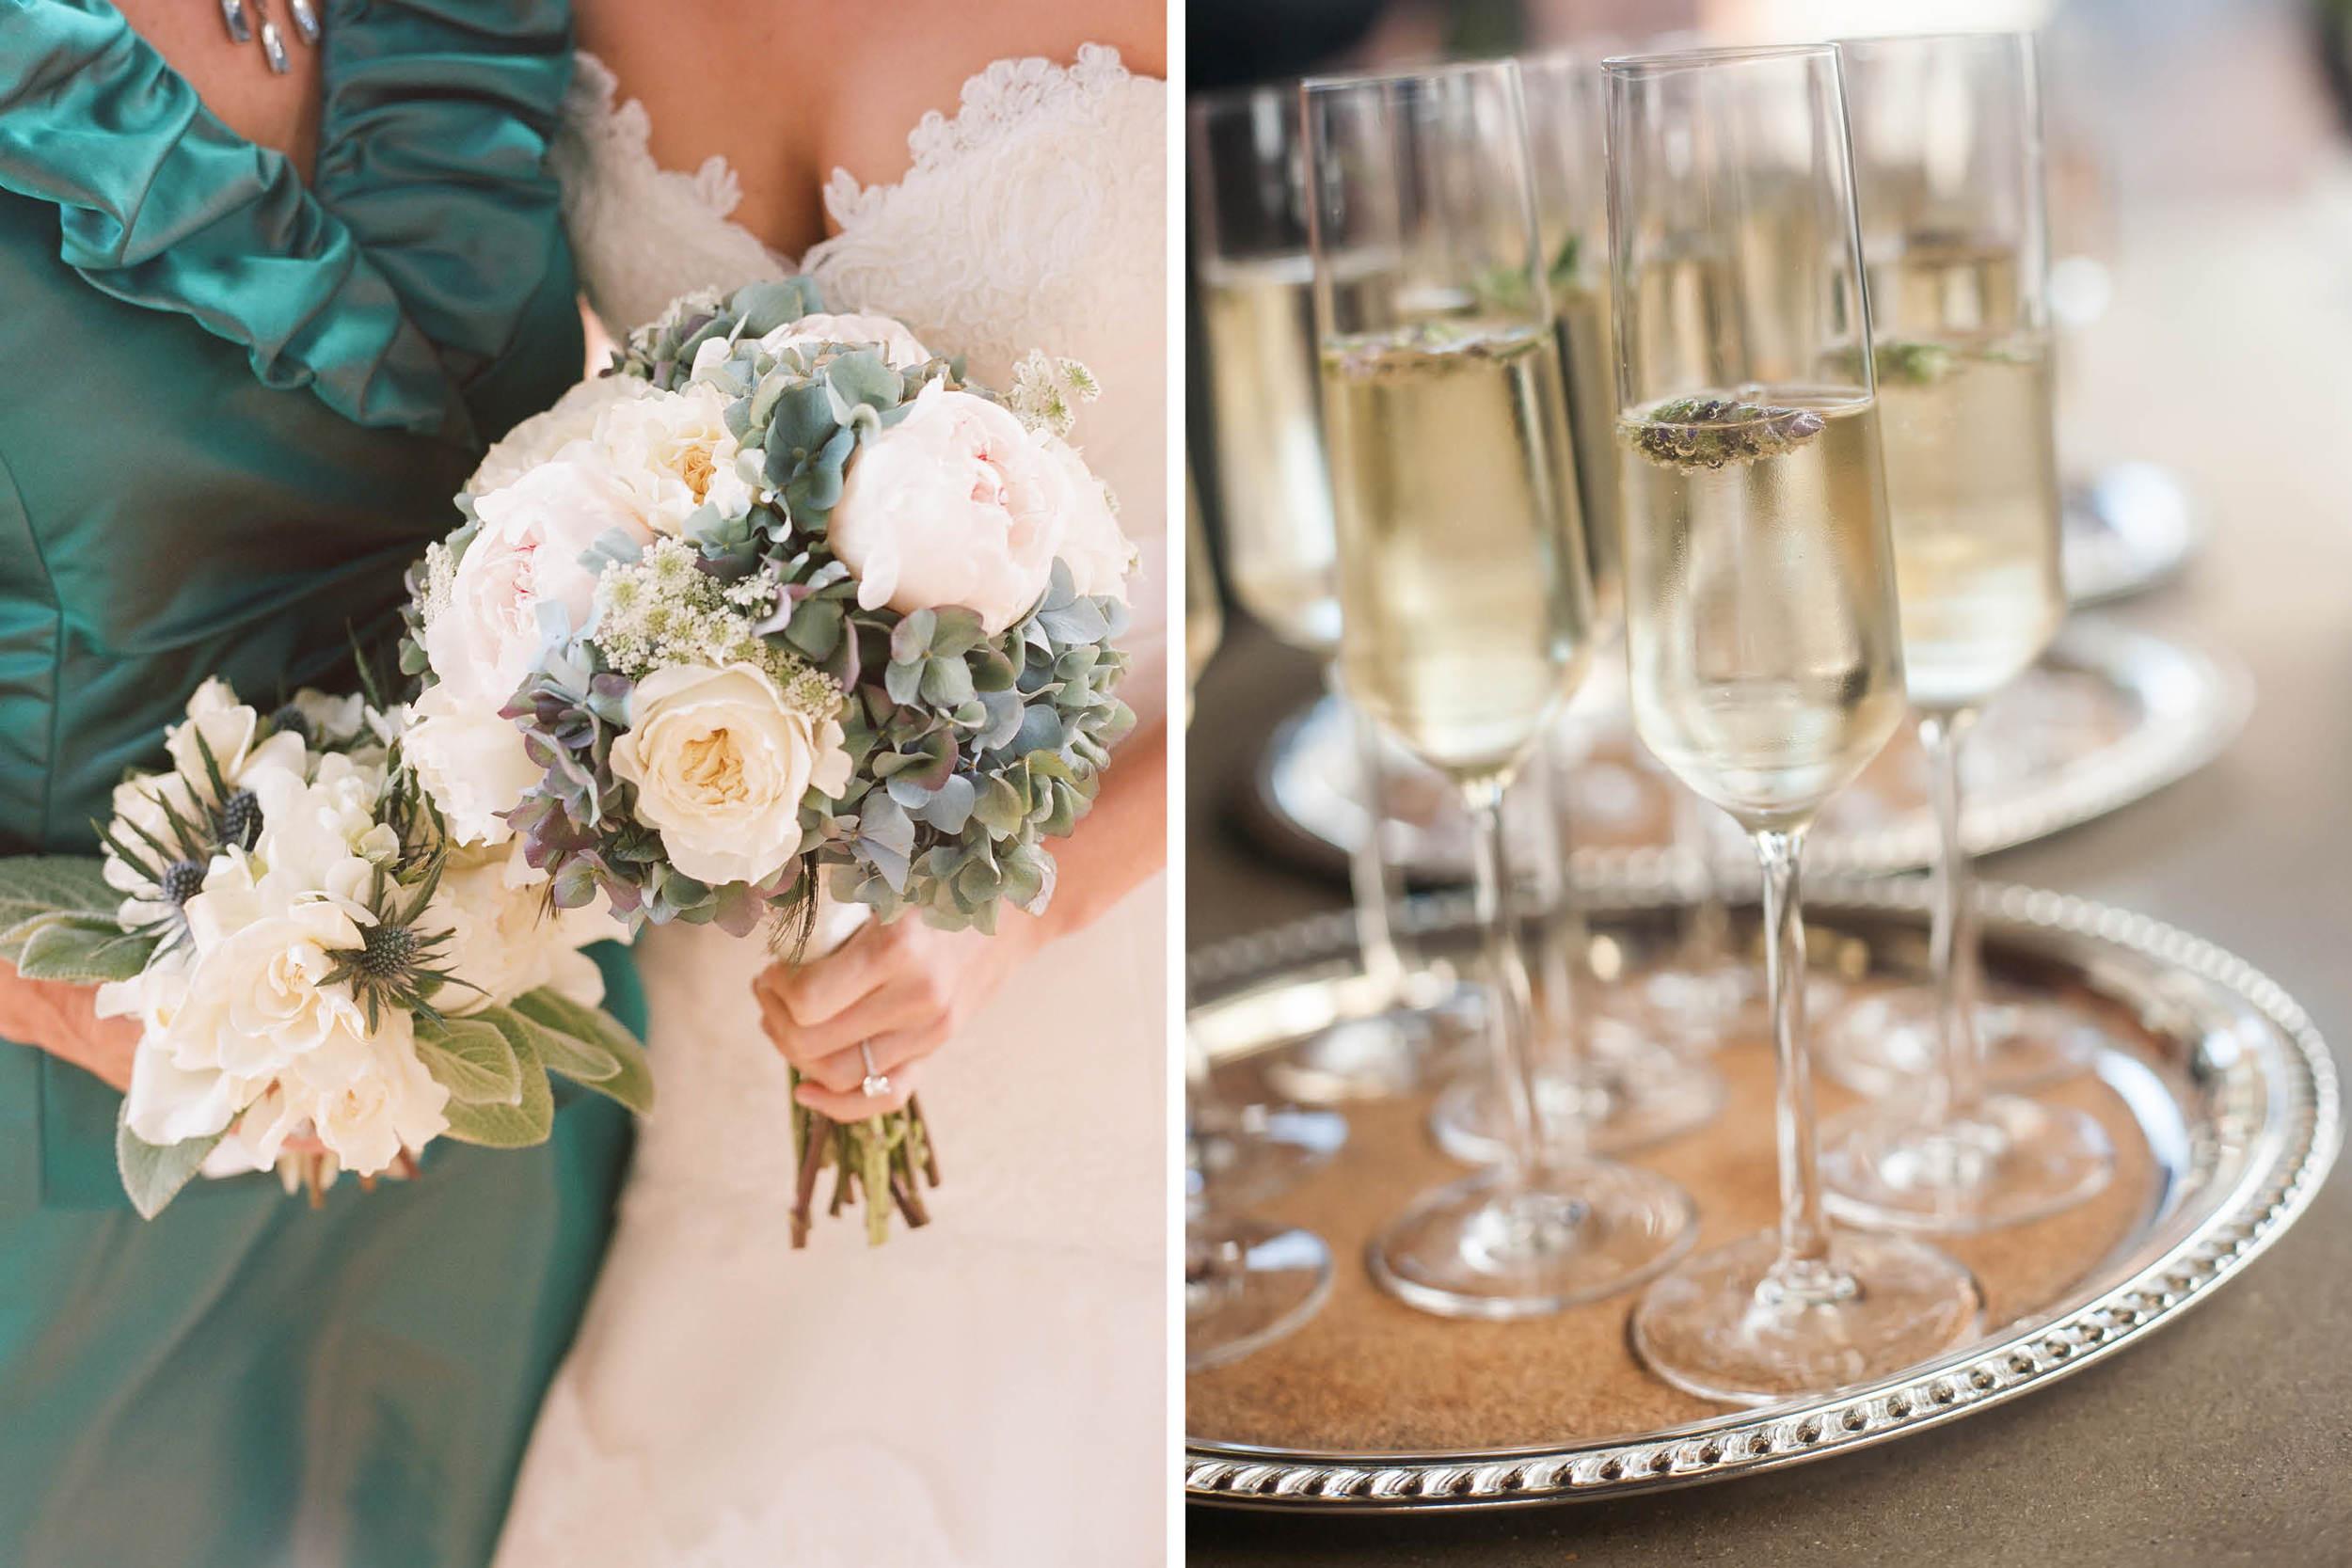 tres-hermanas-winery-vineyard-wedding-planner-coordinator-santa-barbara-ynez-maria (13).jpg